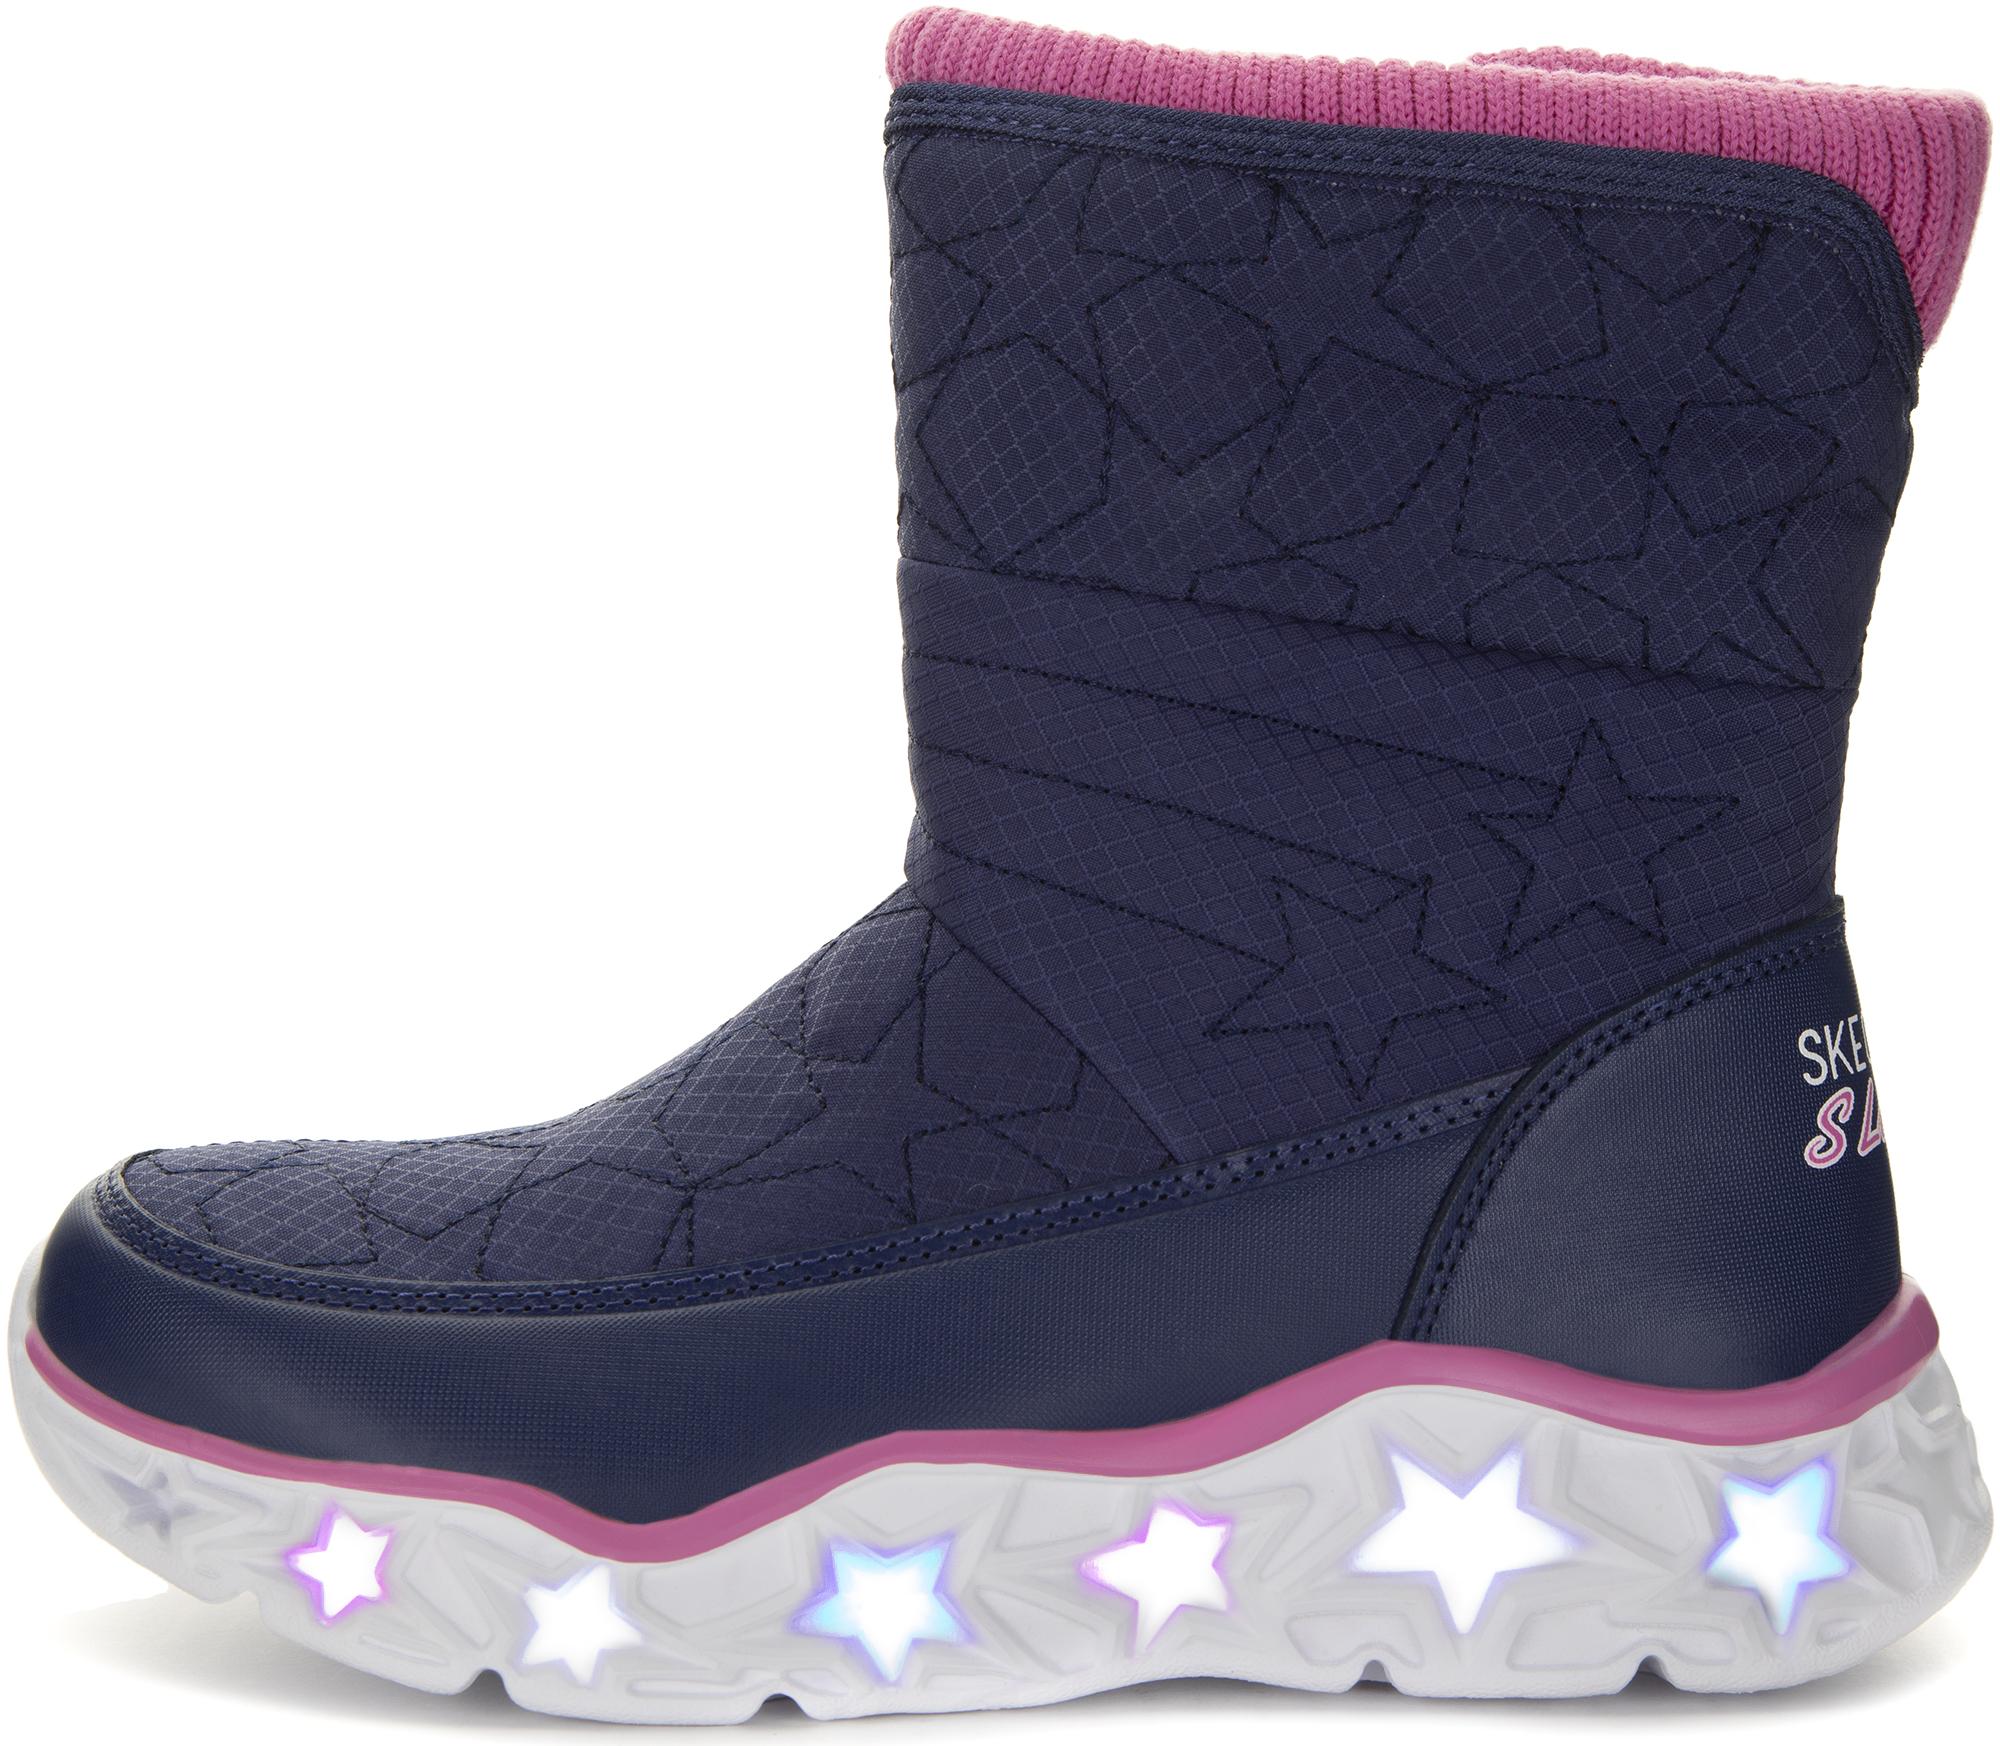 Skechers Сапоги для девочек Galaxy Lights-Star Brights, размер 32